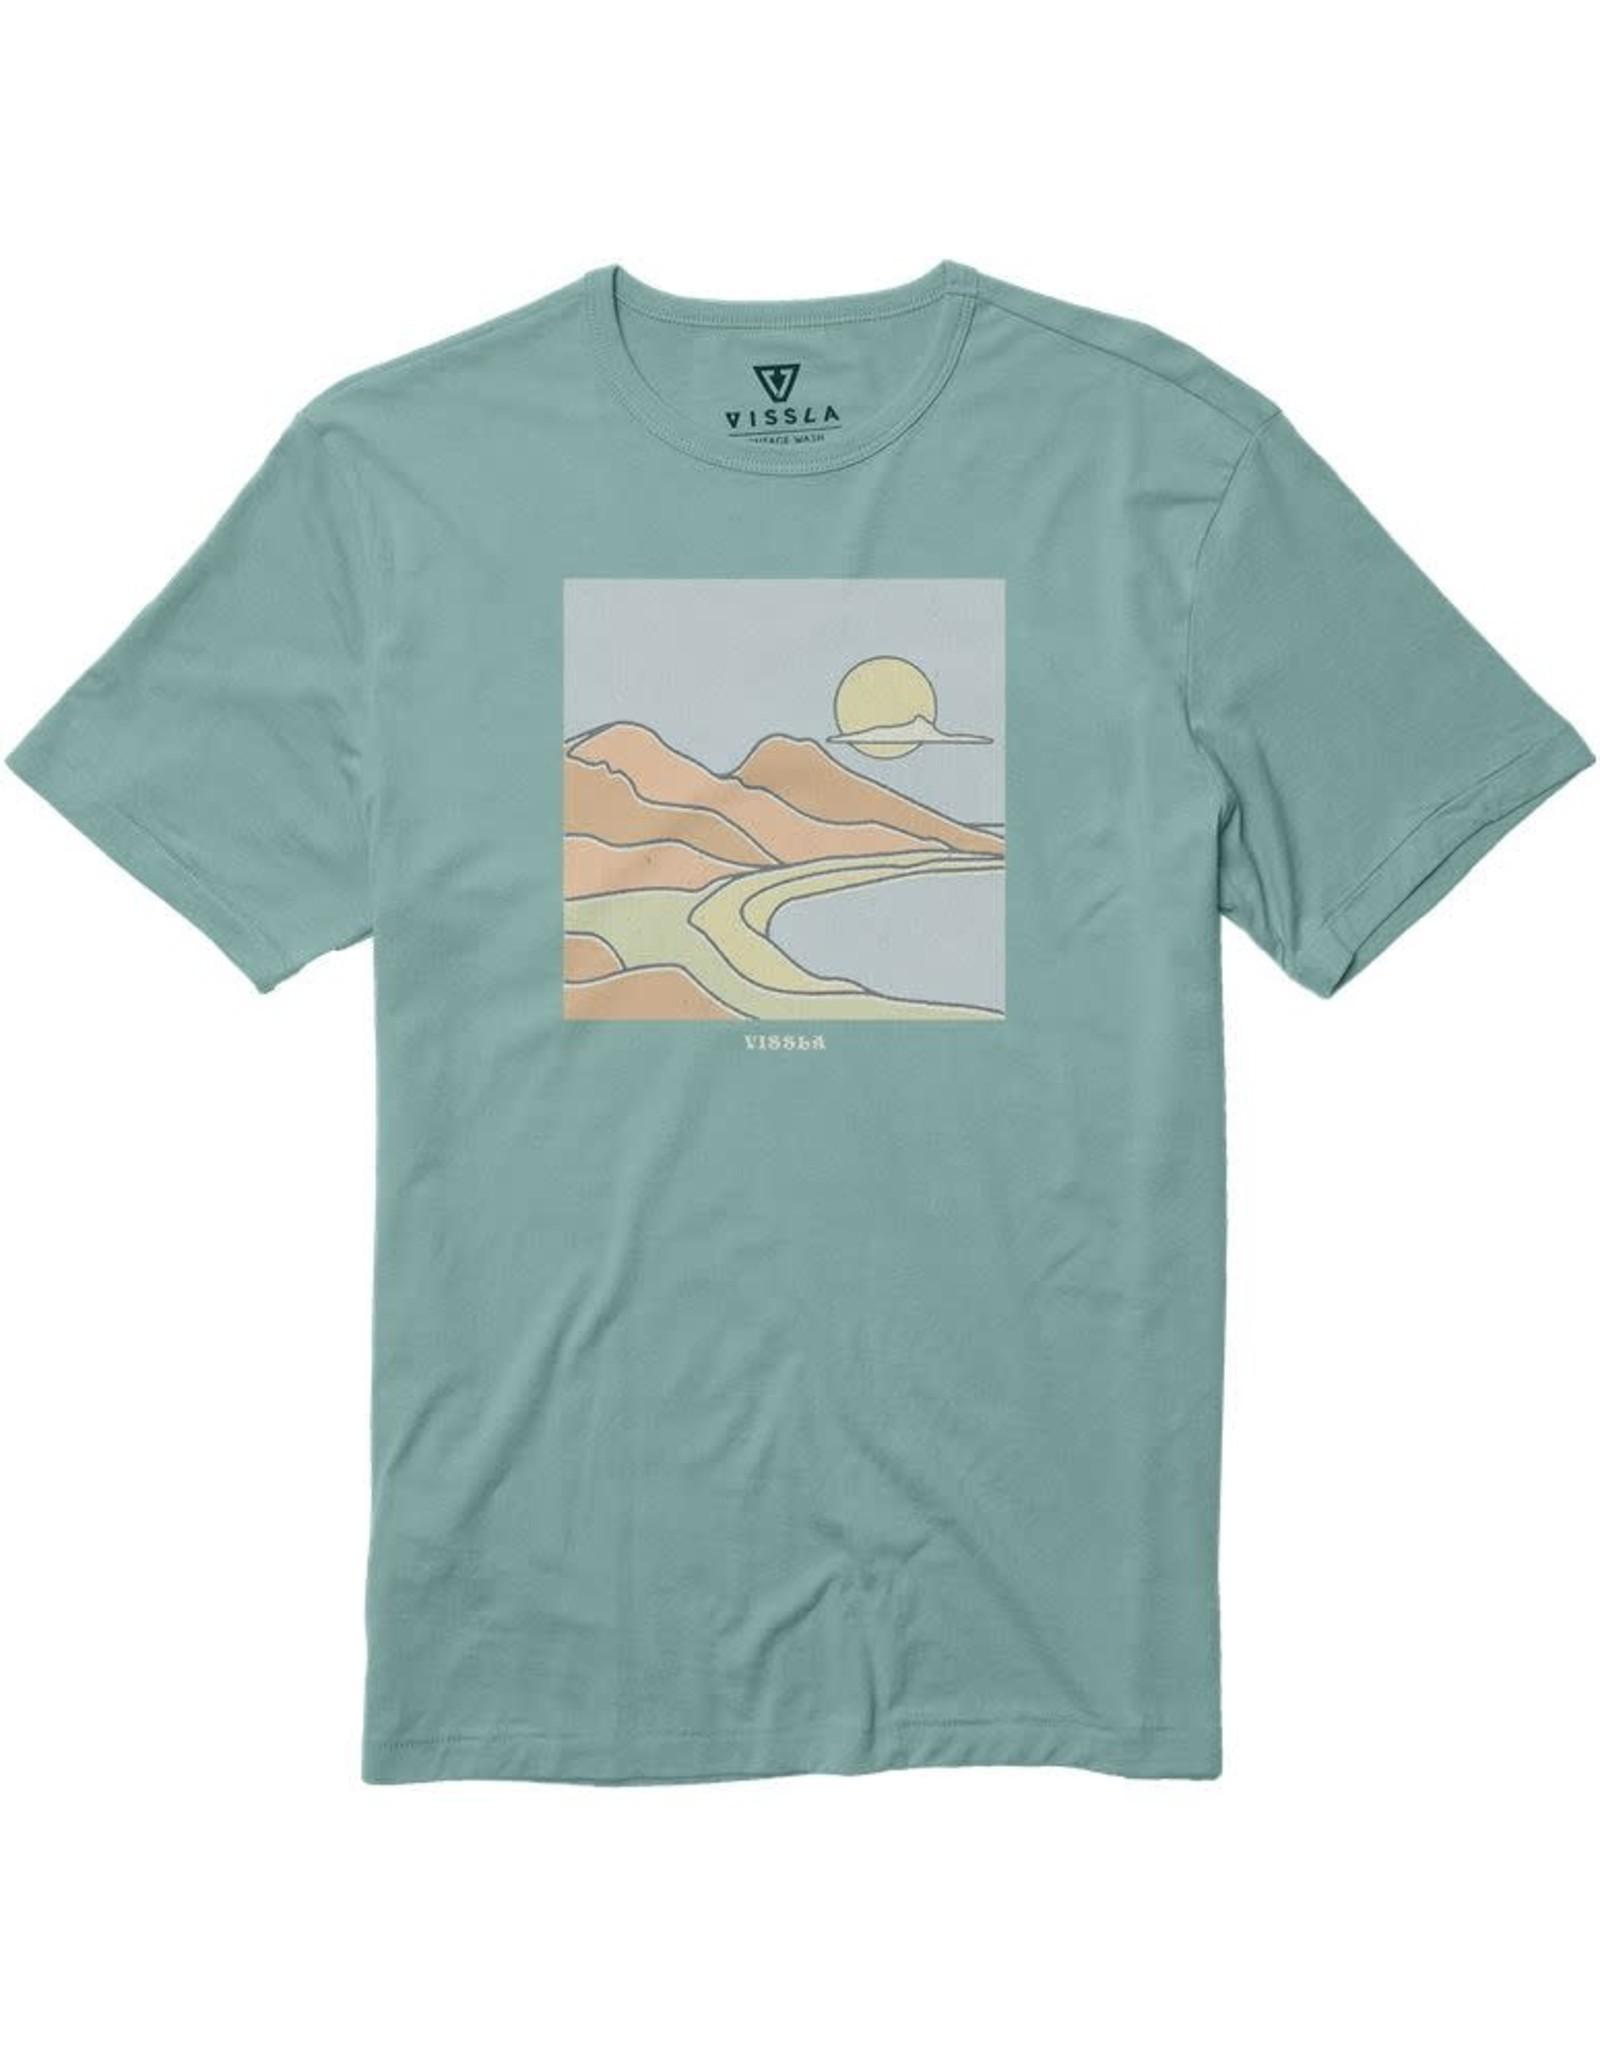 Vissla Vissla - T-shirt homme real fun wow jade